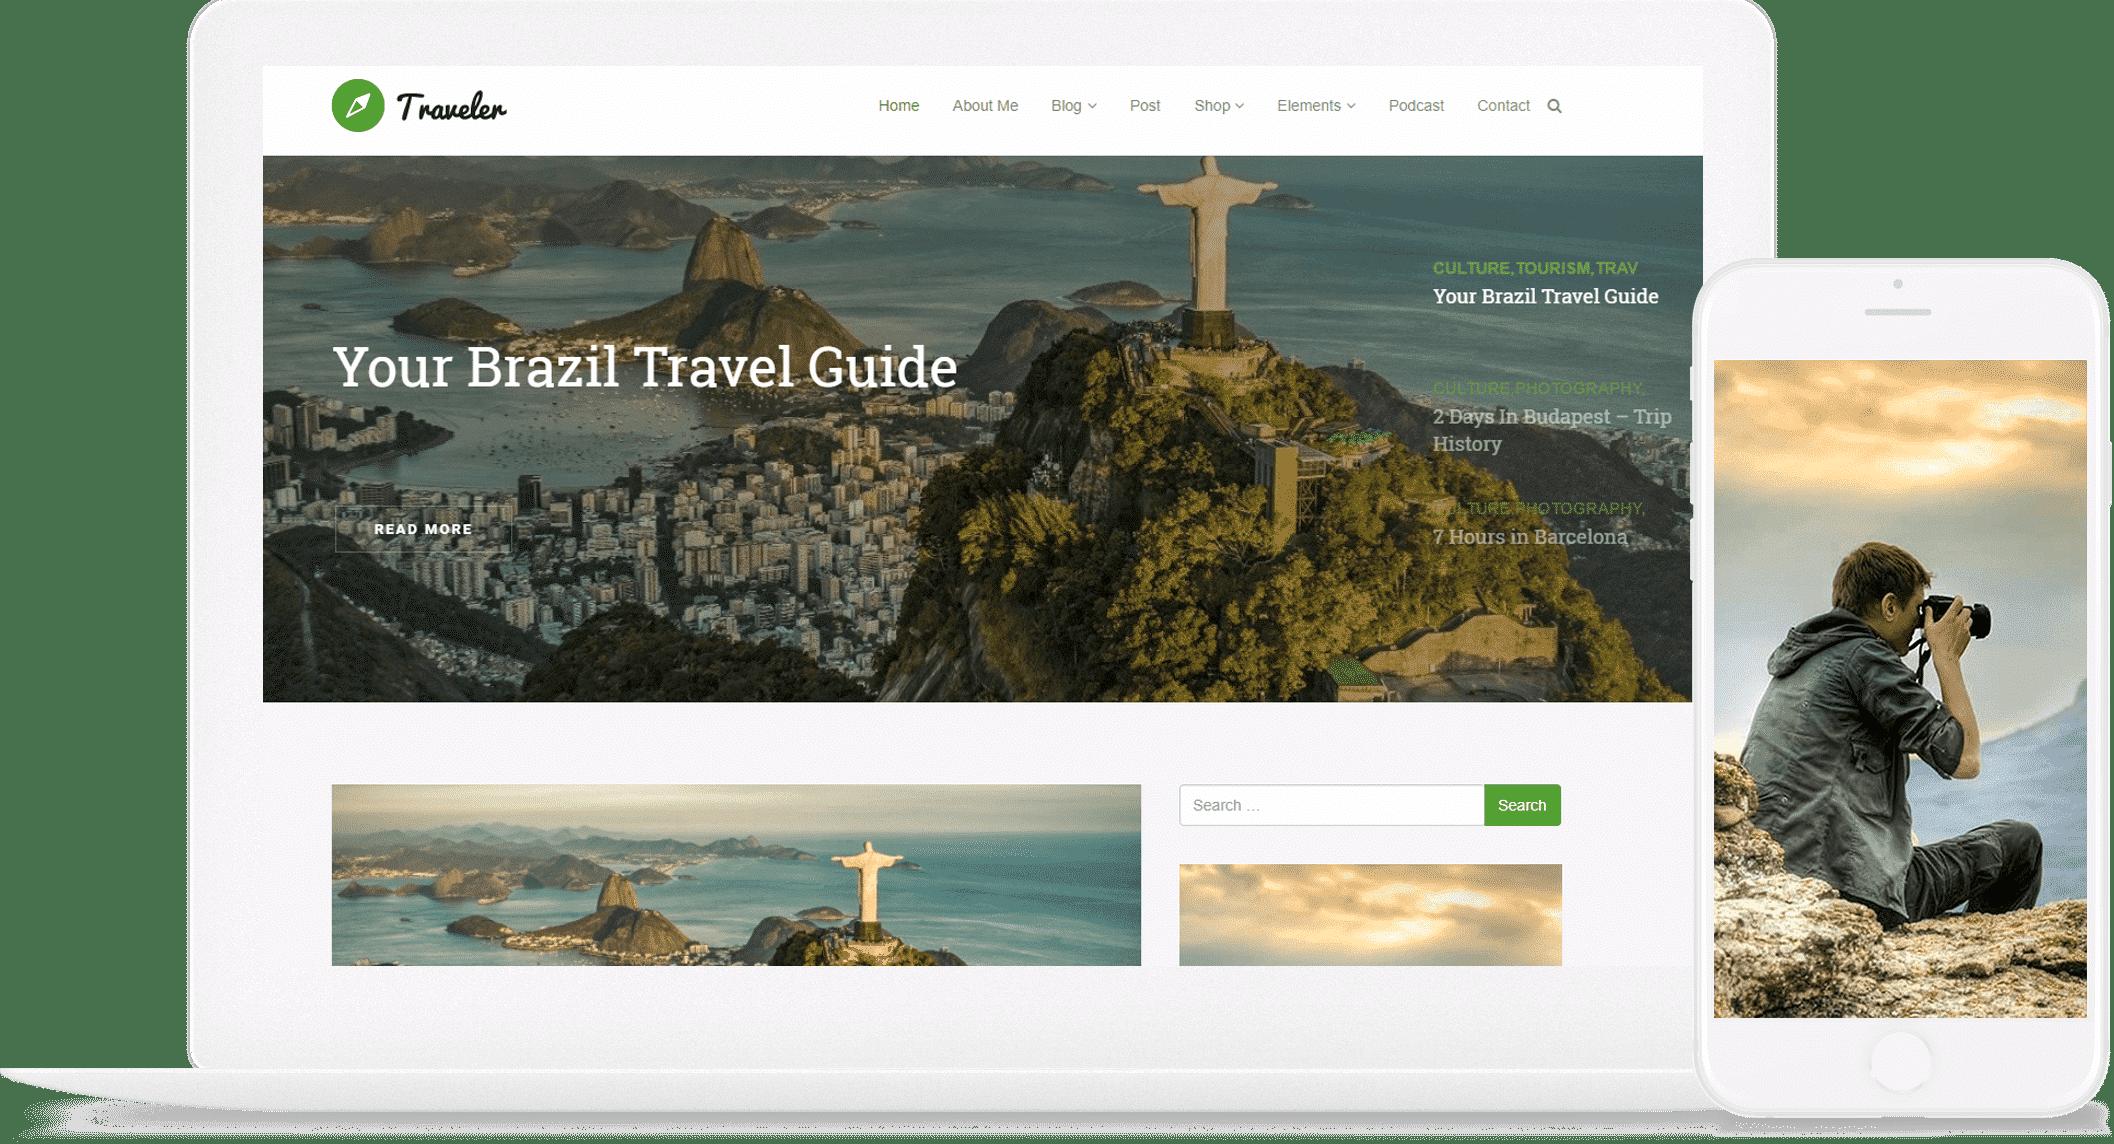 Wordpress Theme Template | Traveler Wordpress Theme Blog Wordpress Template By Visualmodo